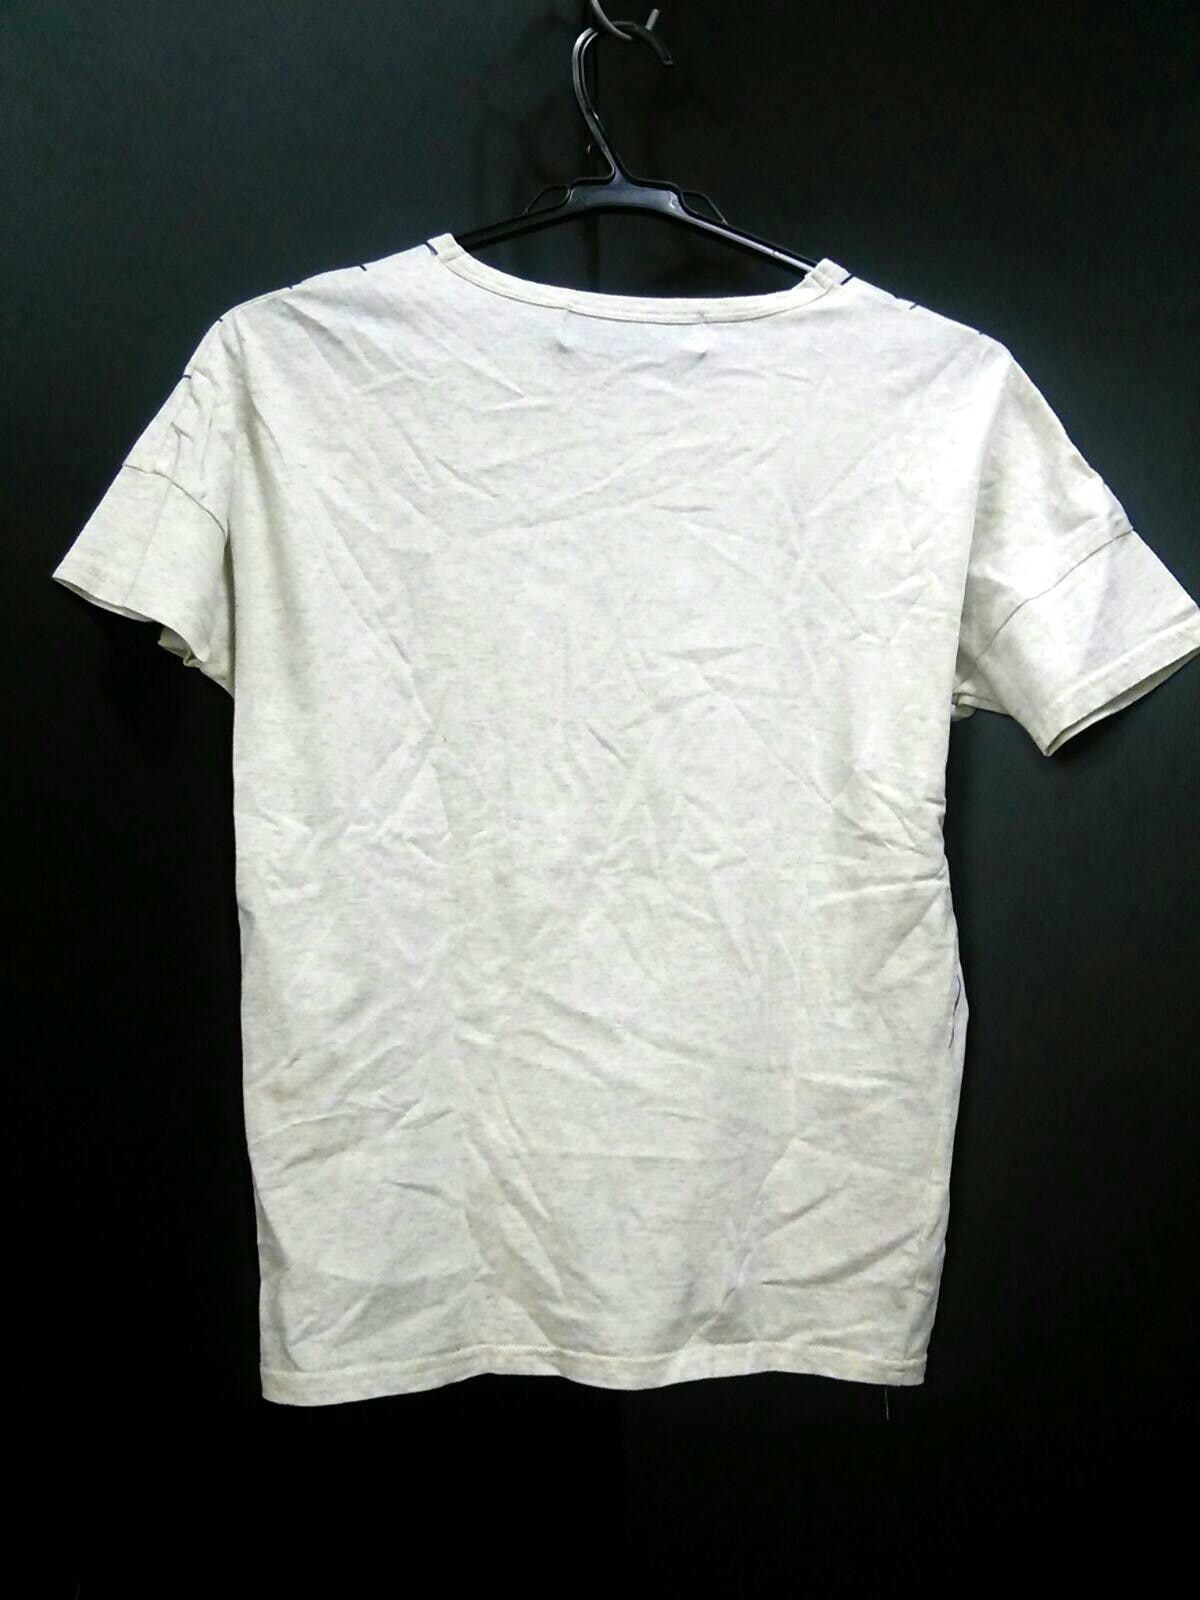 short cut FOR MARKS(ショートカットフォーマークス)のTシャツ